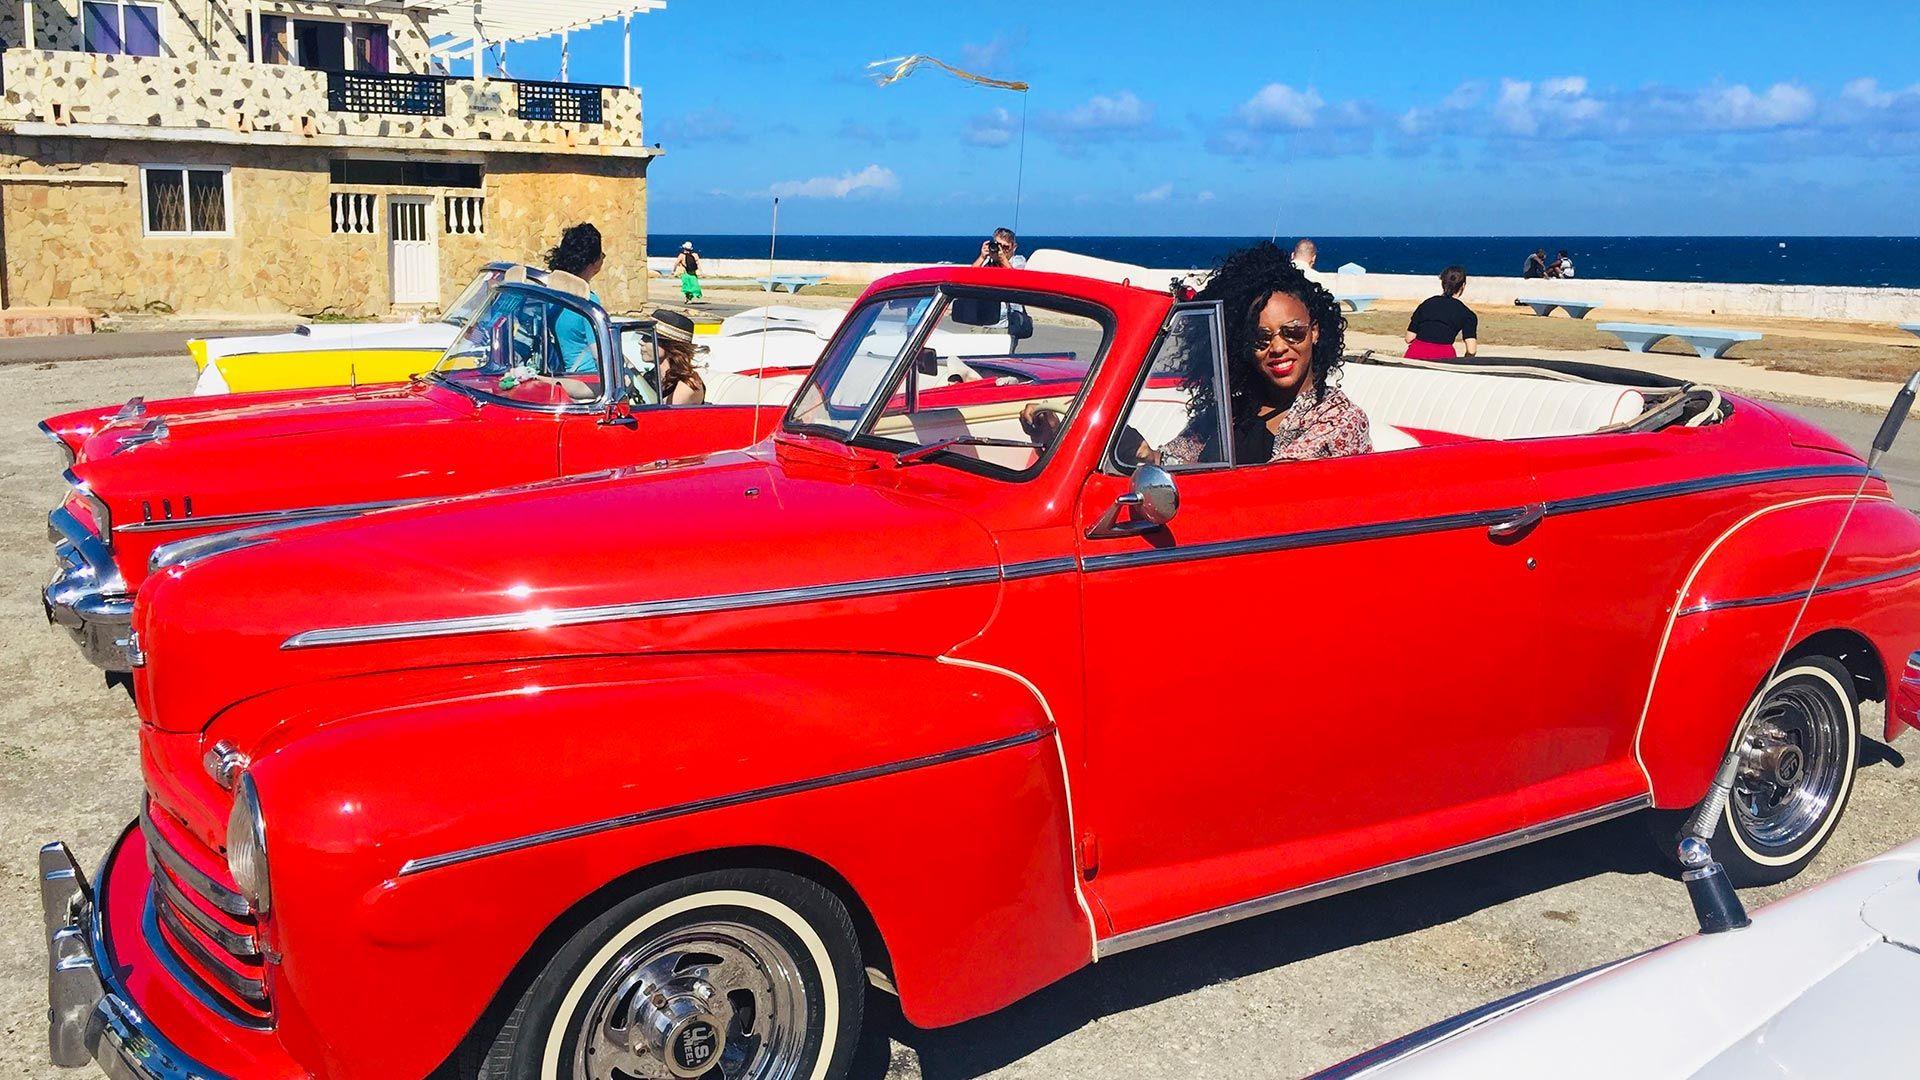 Circuit de grup - Experience Cuba Linda - 17 zile cu Yulicary Sarracent